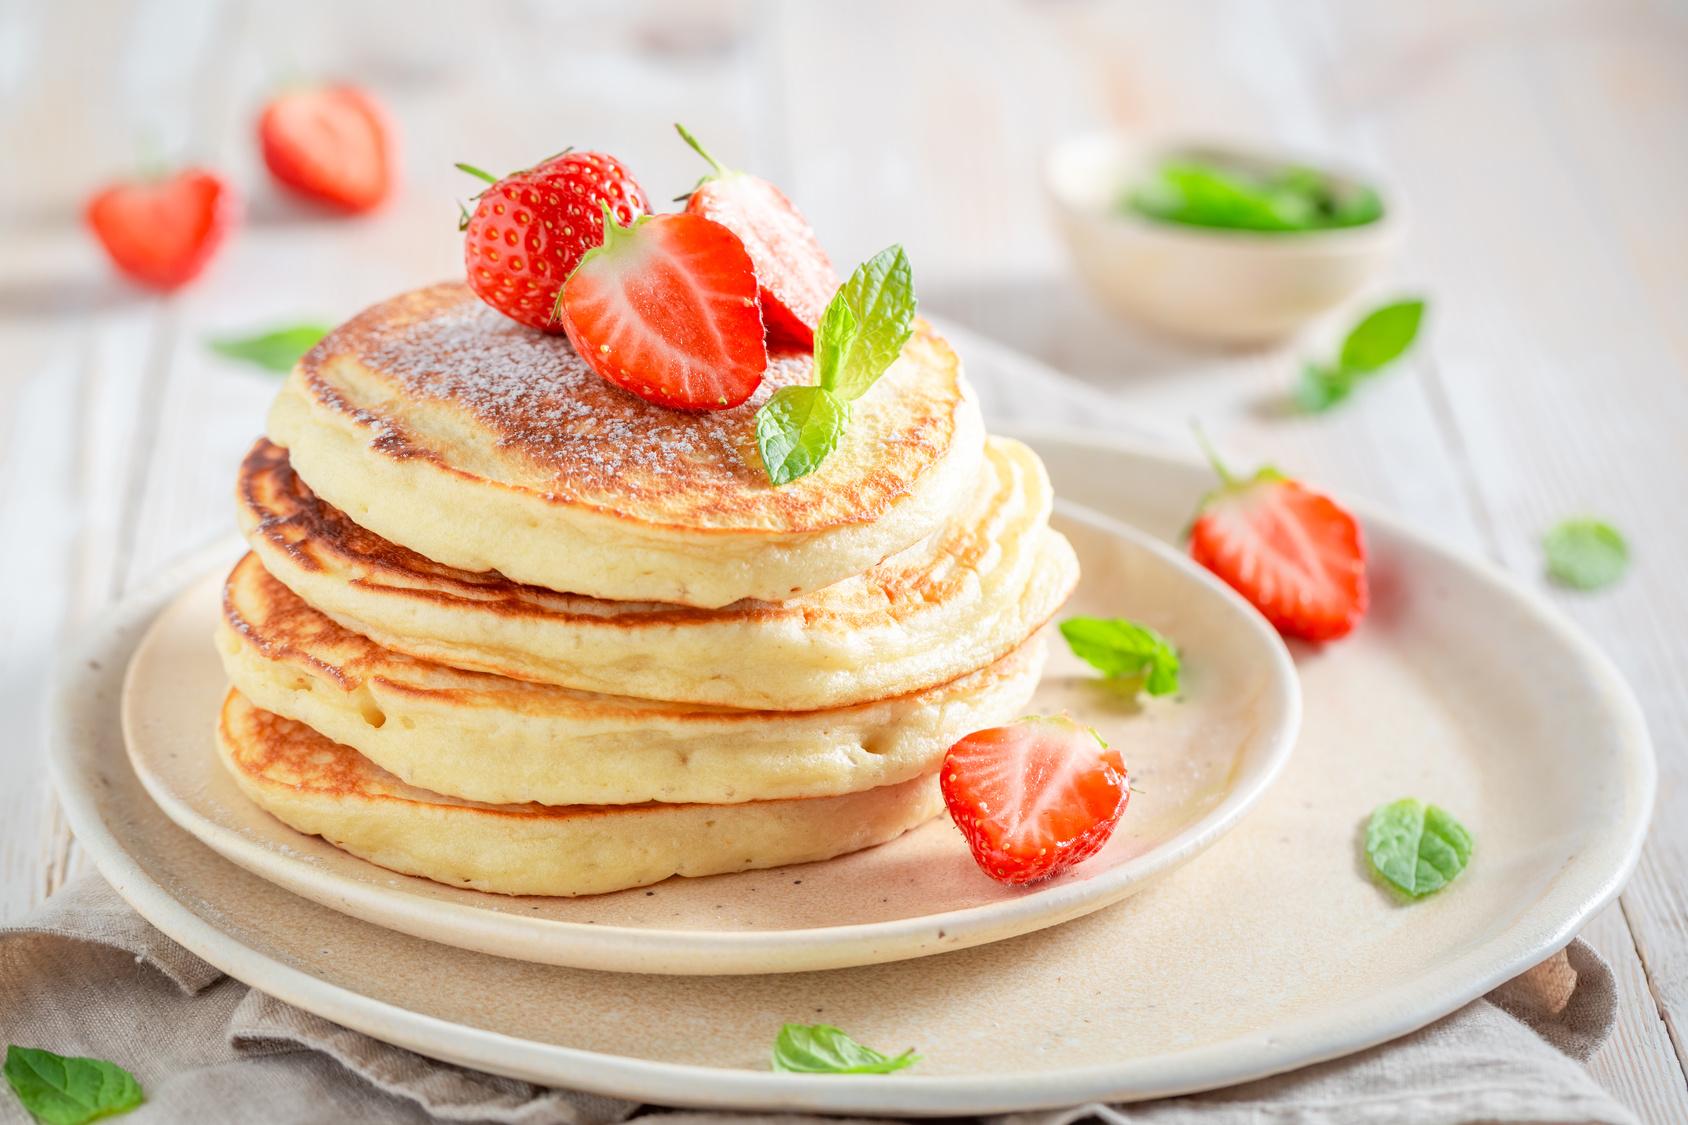 Ricetta Pancake Ipocalorici.Pancakes Allo Yogurt Light La Cucina Salutare